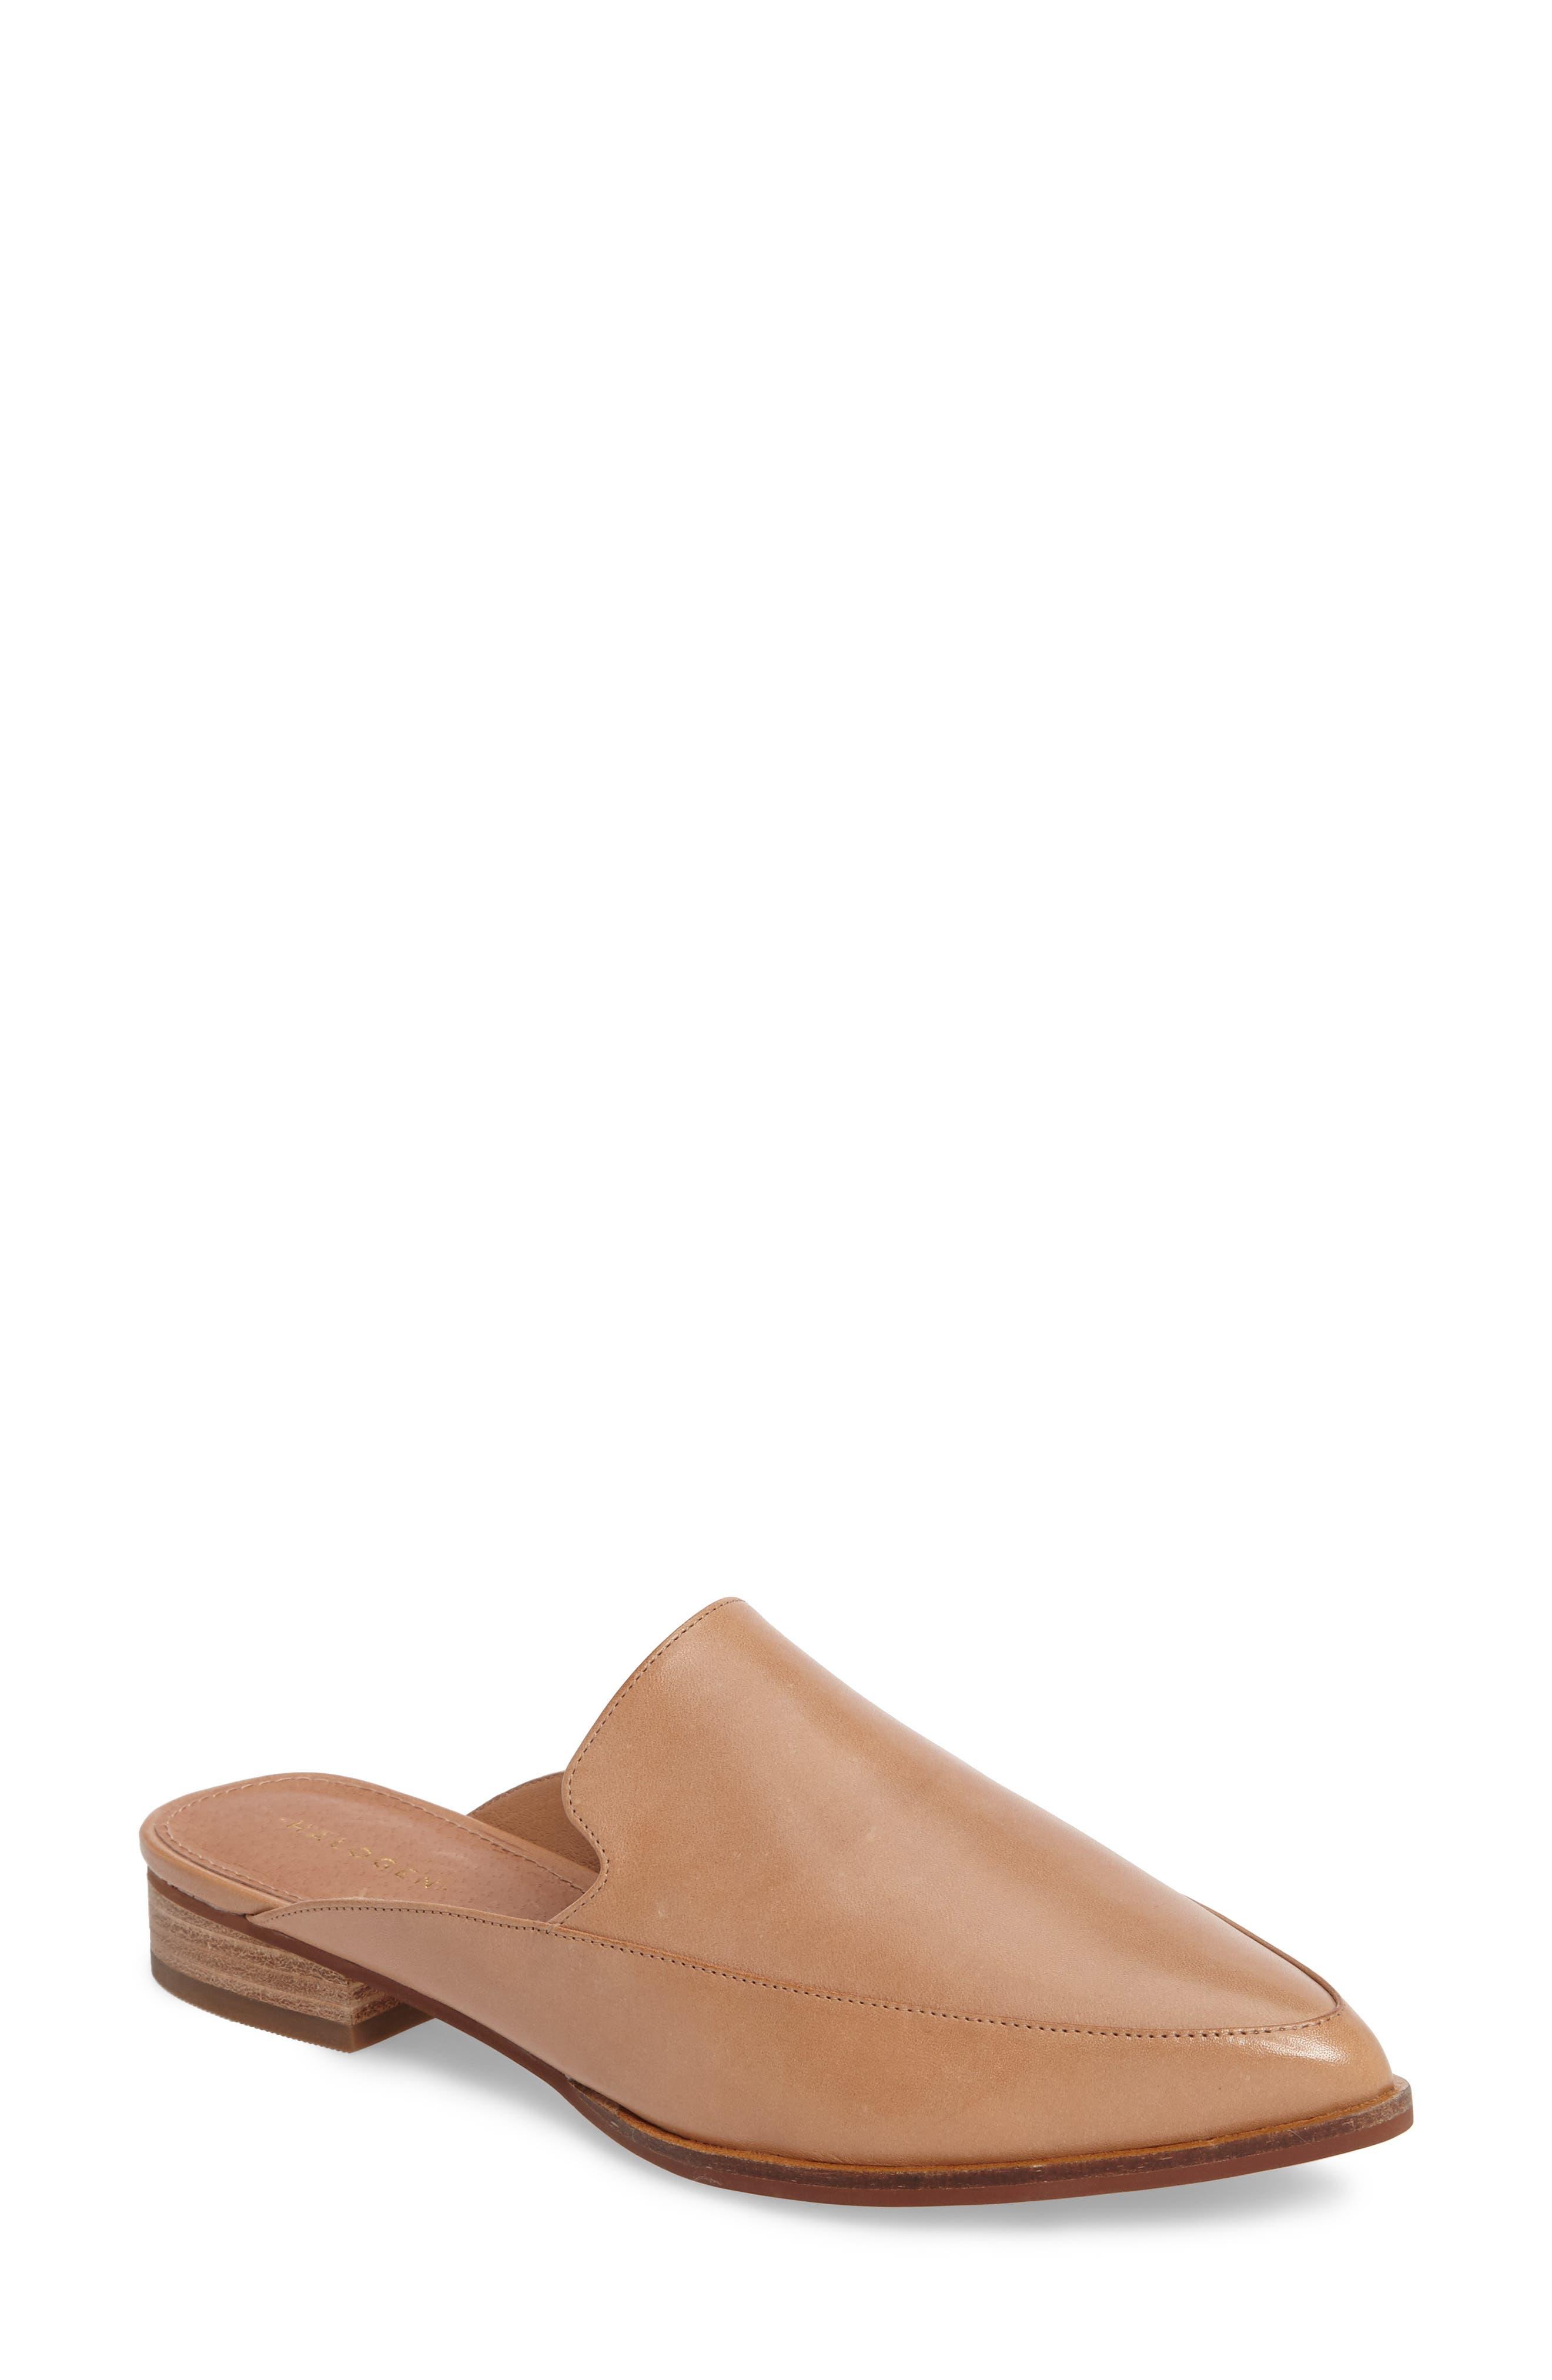 Corbin Genuine Calf Hair Slide Loafer,                             Main thumbnail 4, color,